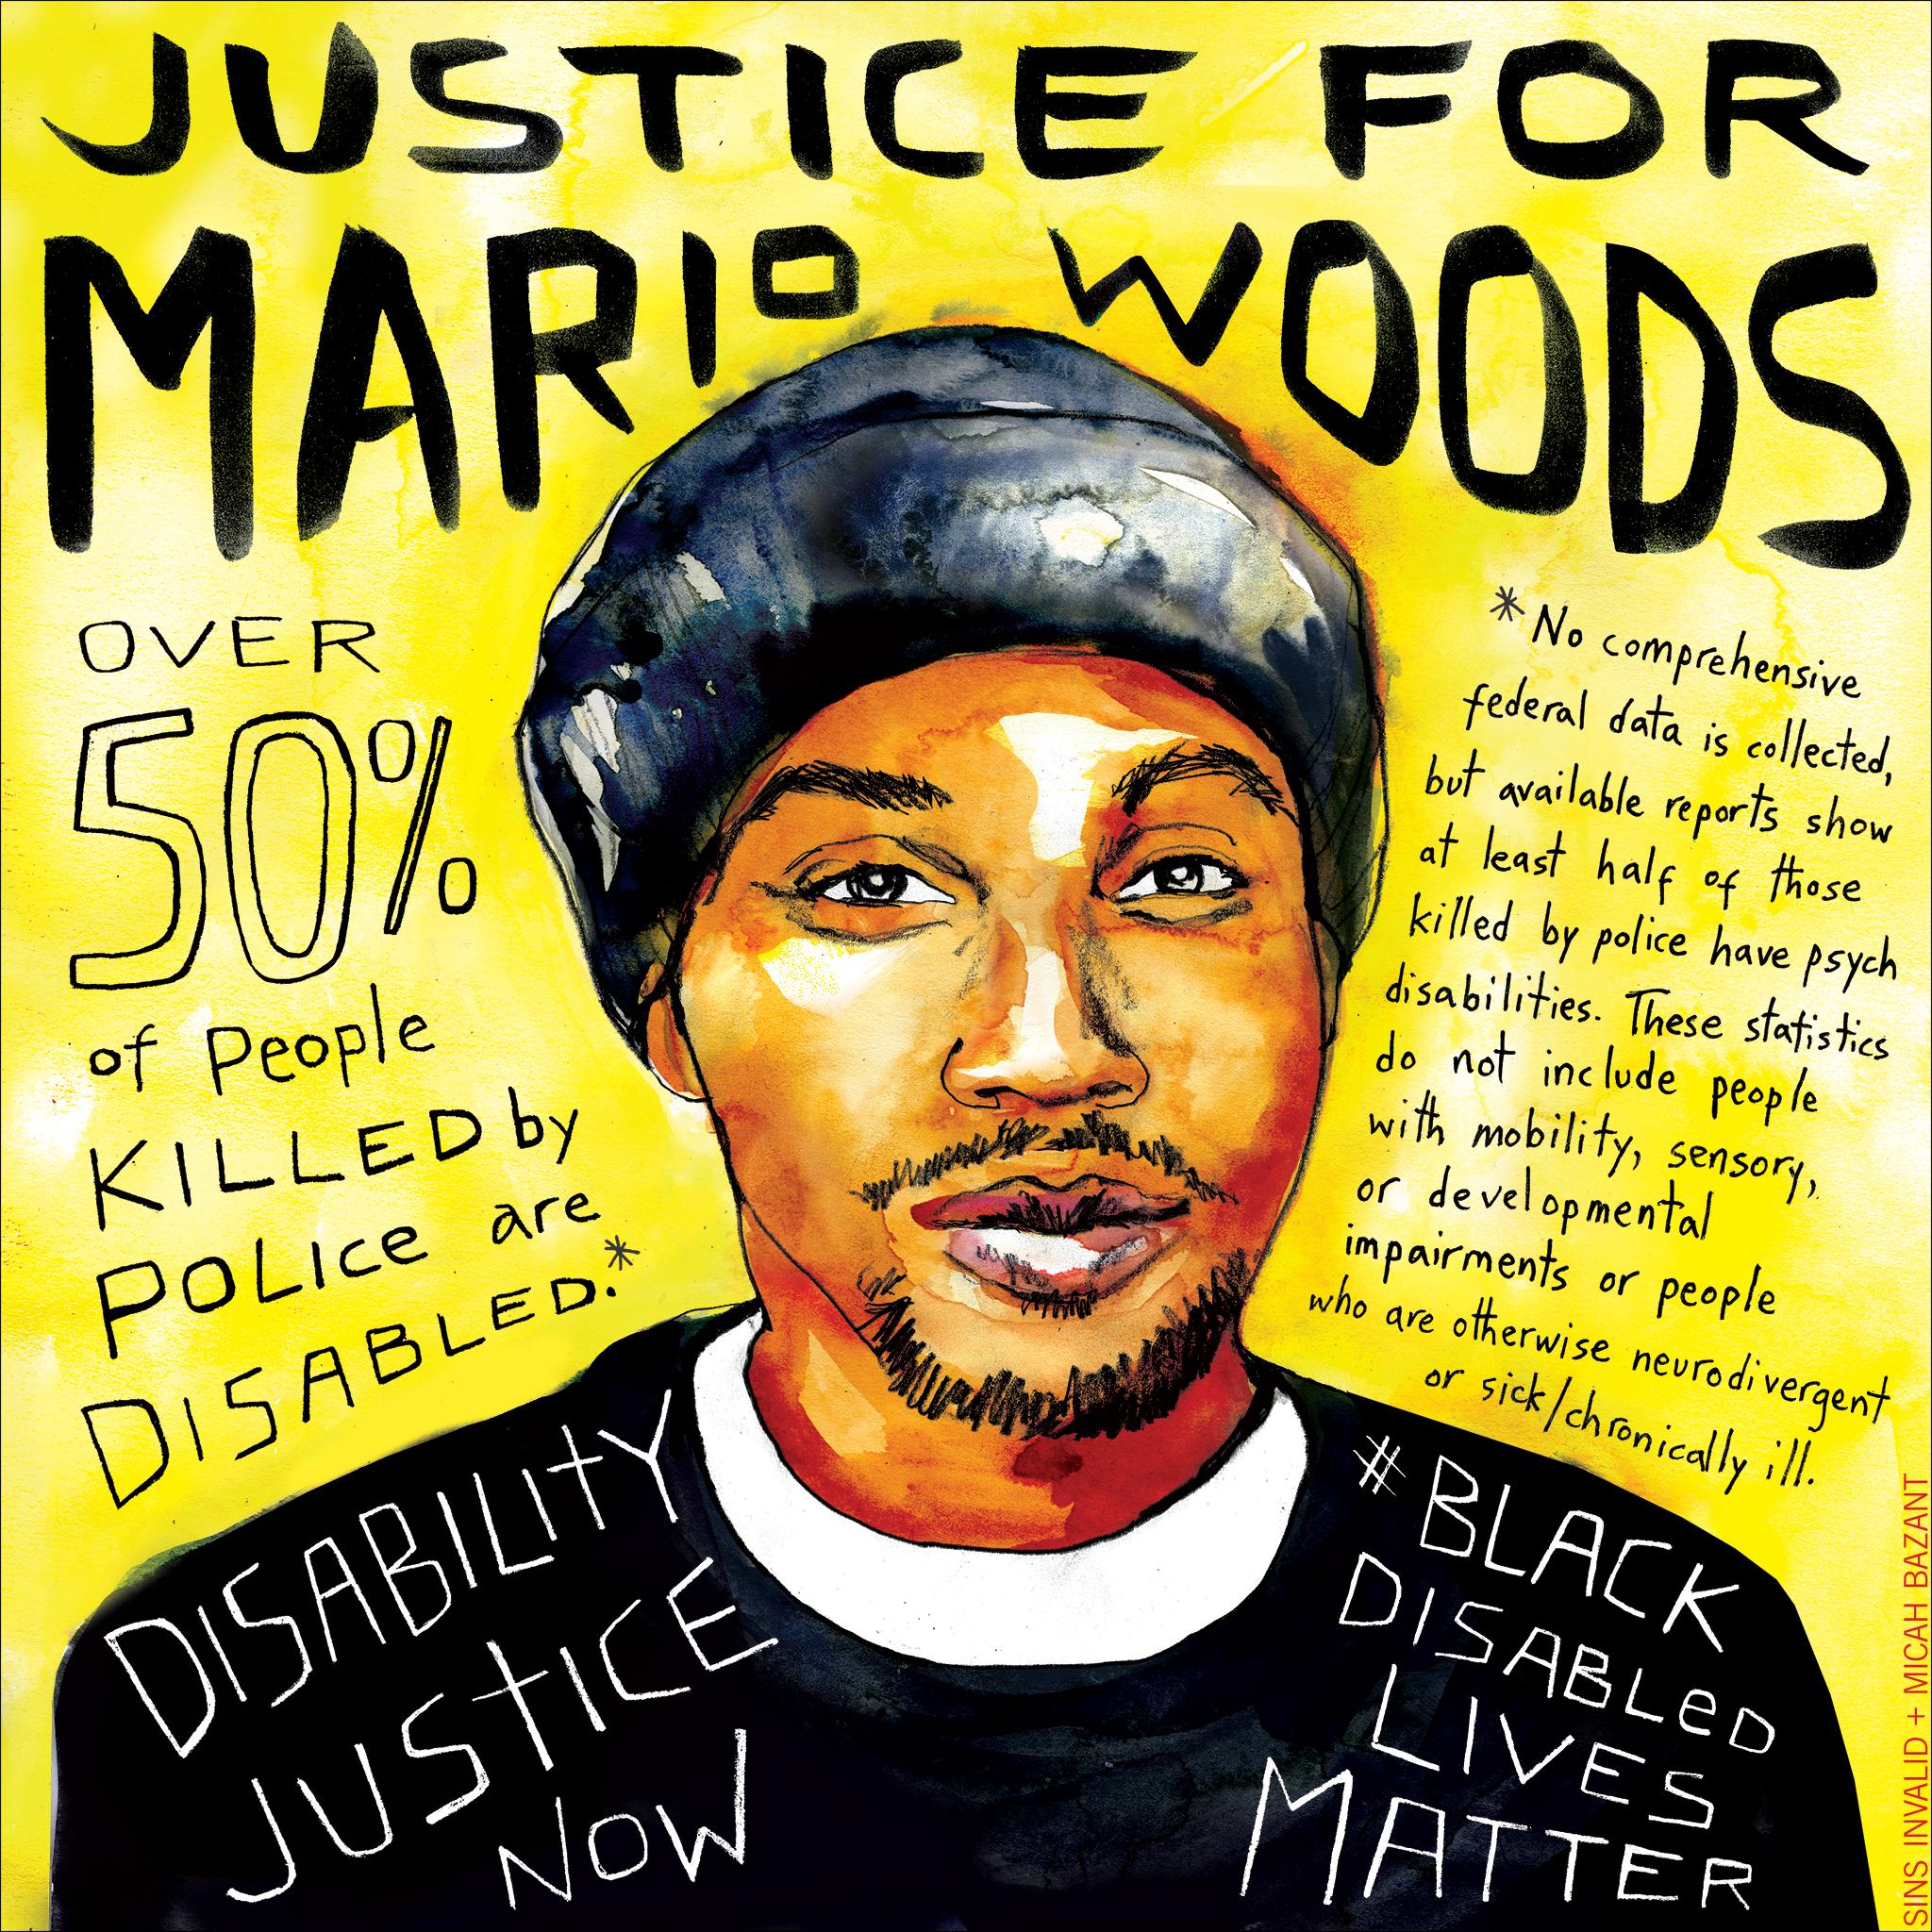 JusticeForMarioWoods